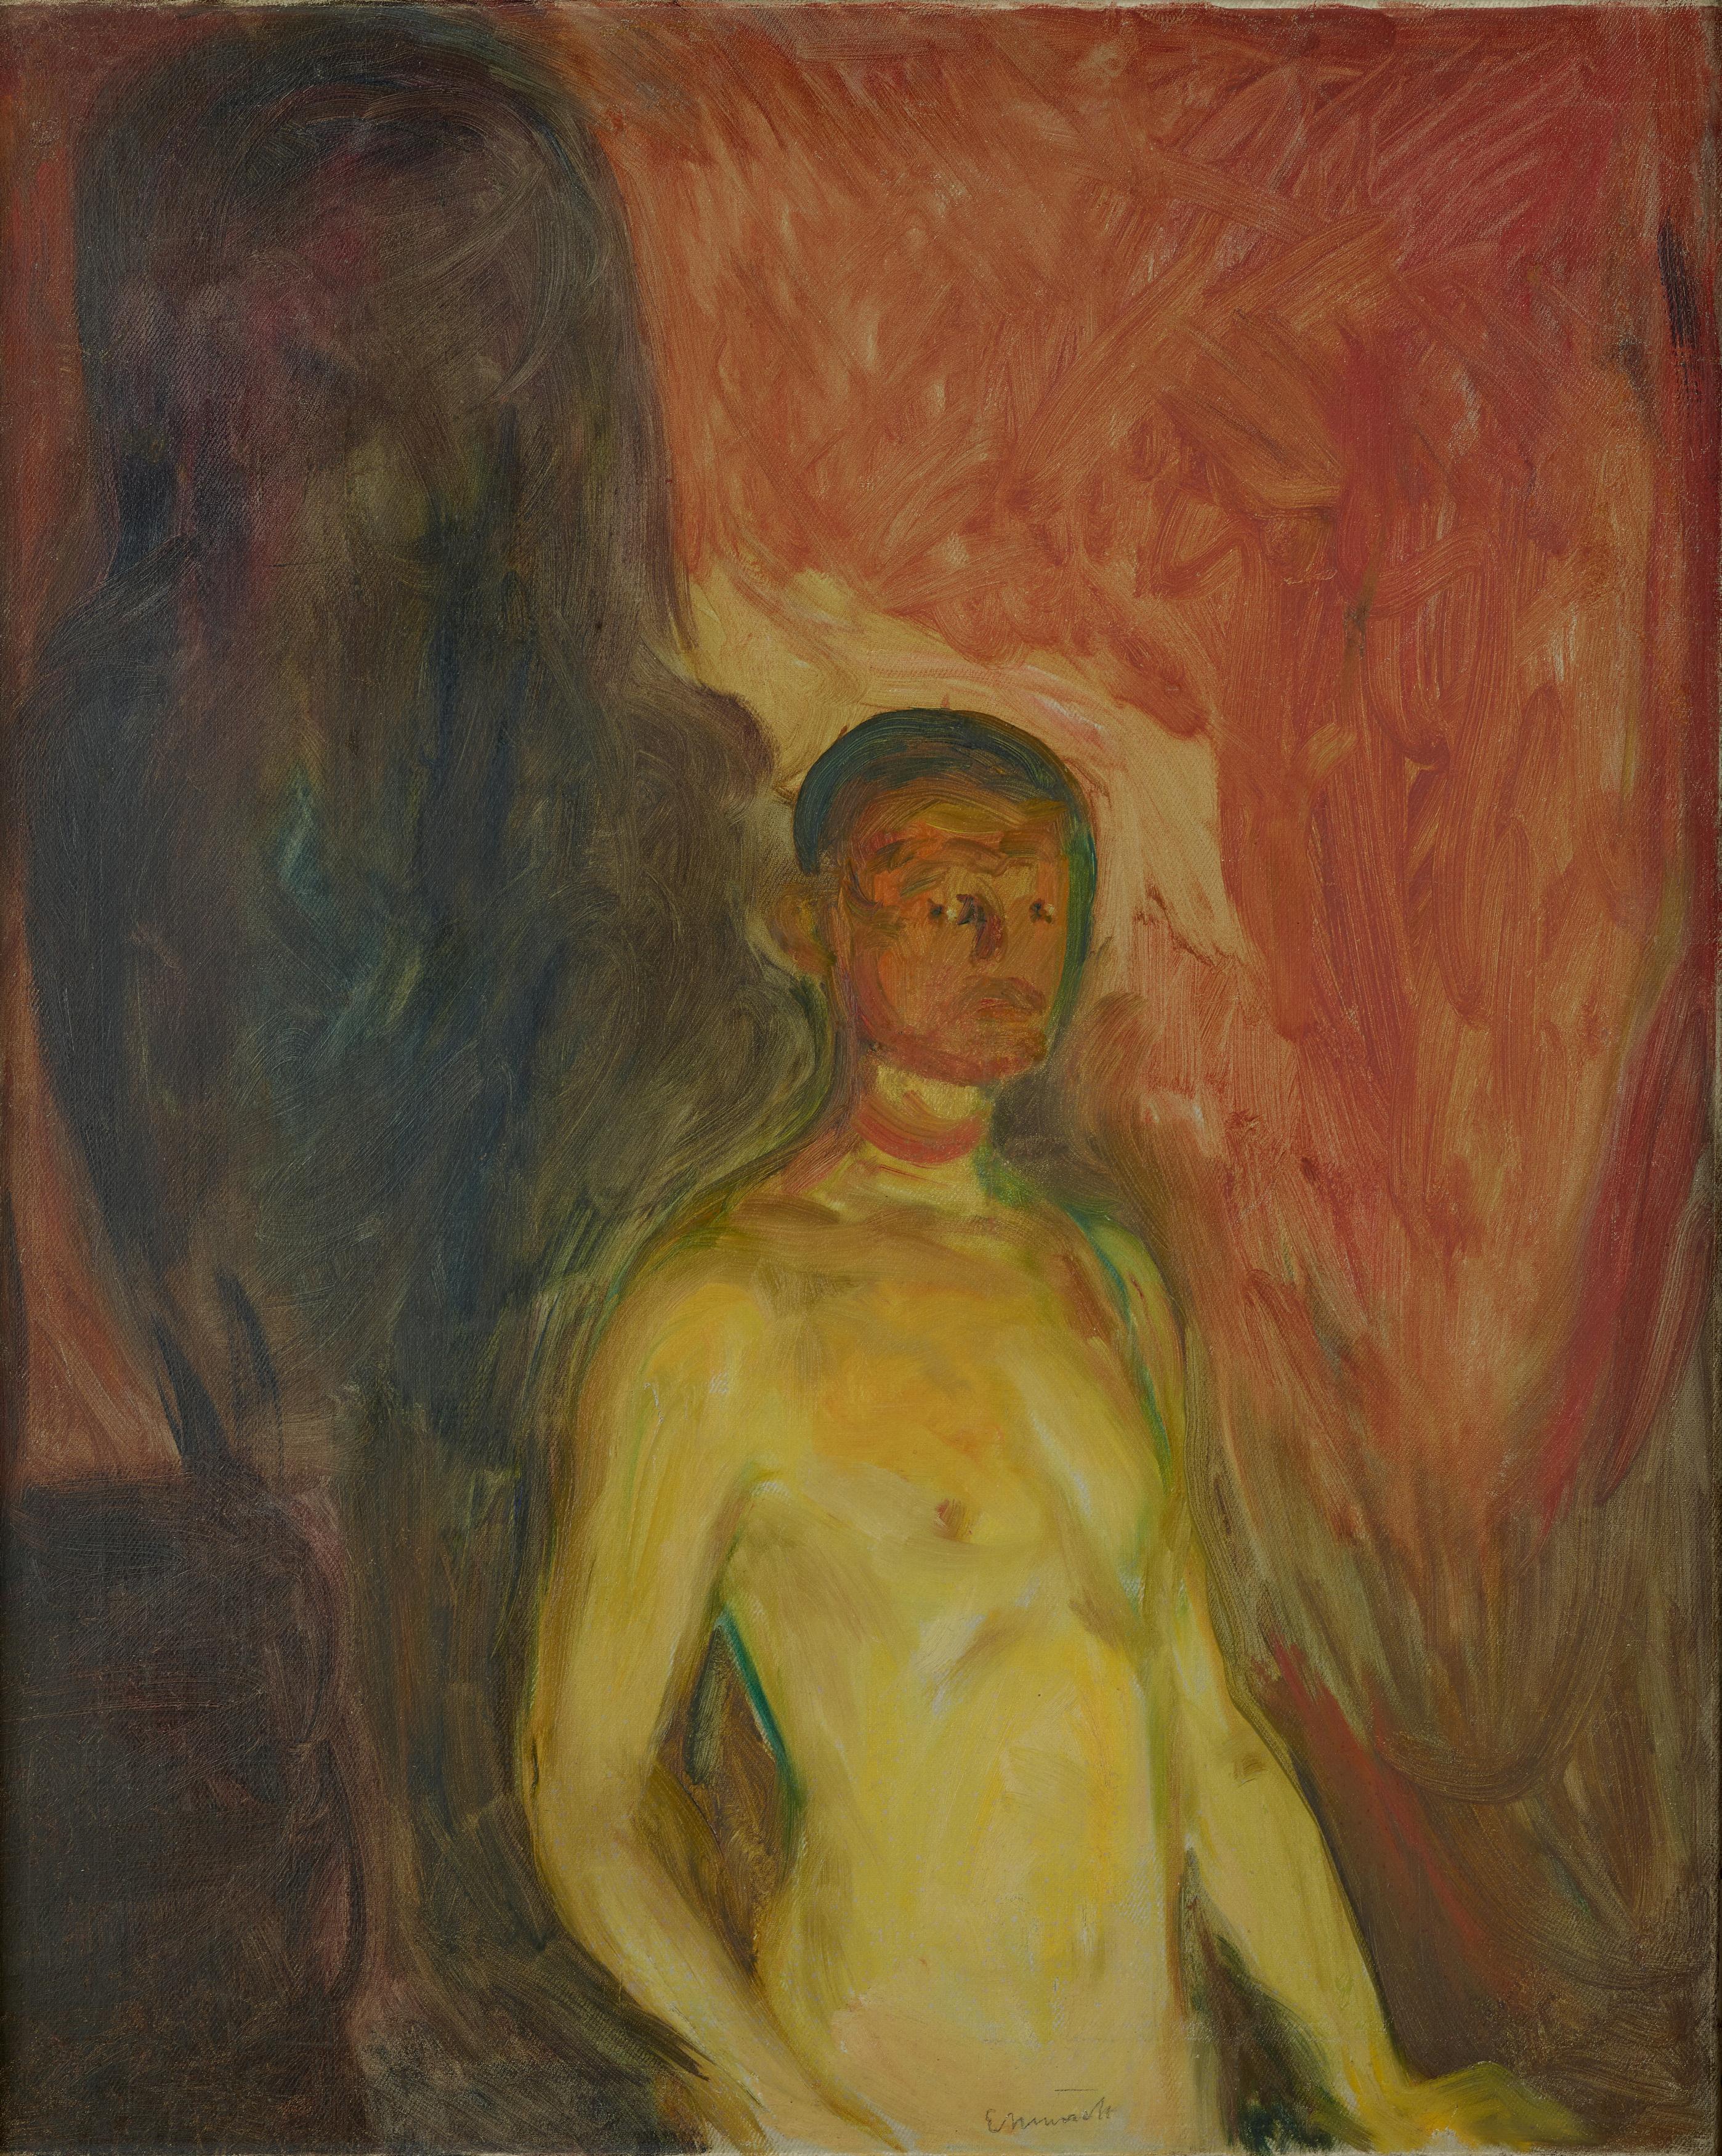 """Self-Portrait in Hell"", Edvard Munch (1903)"